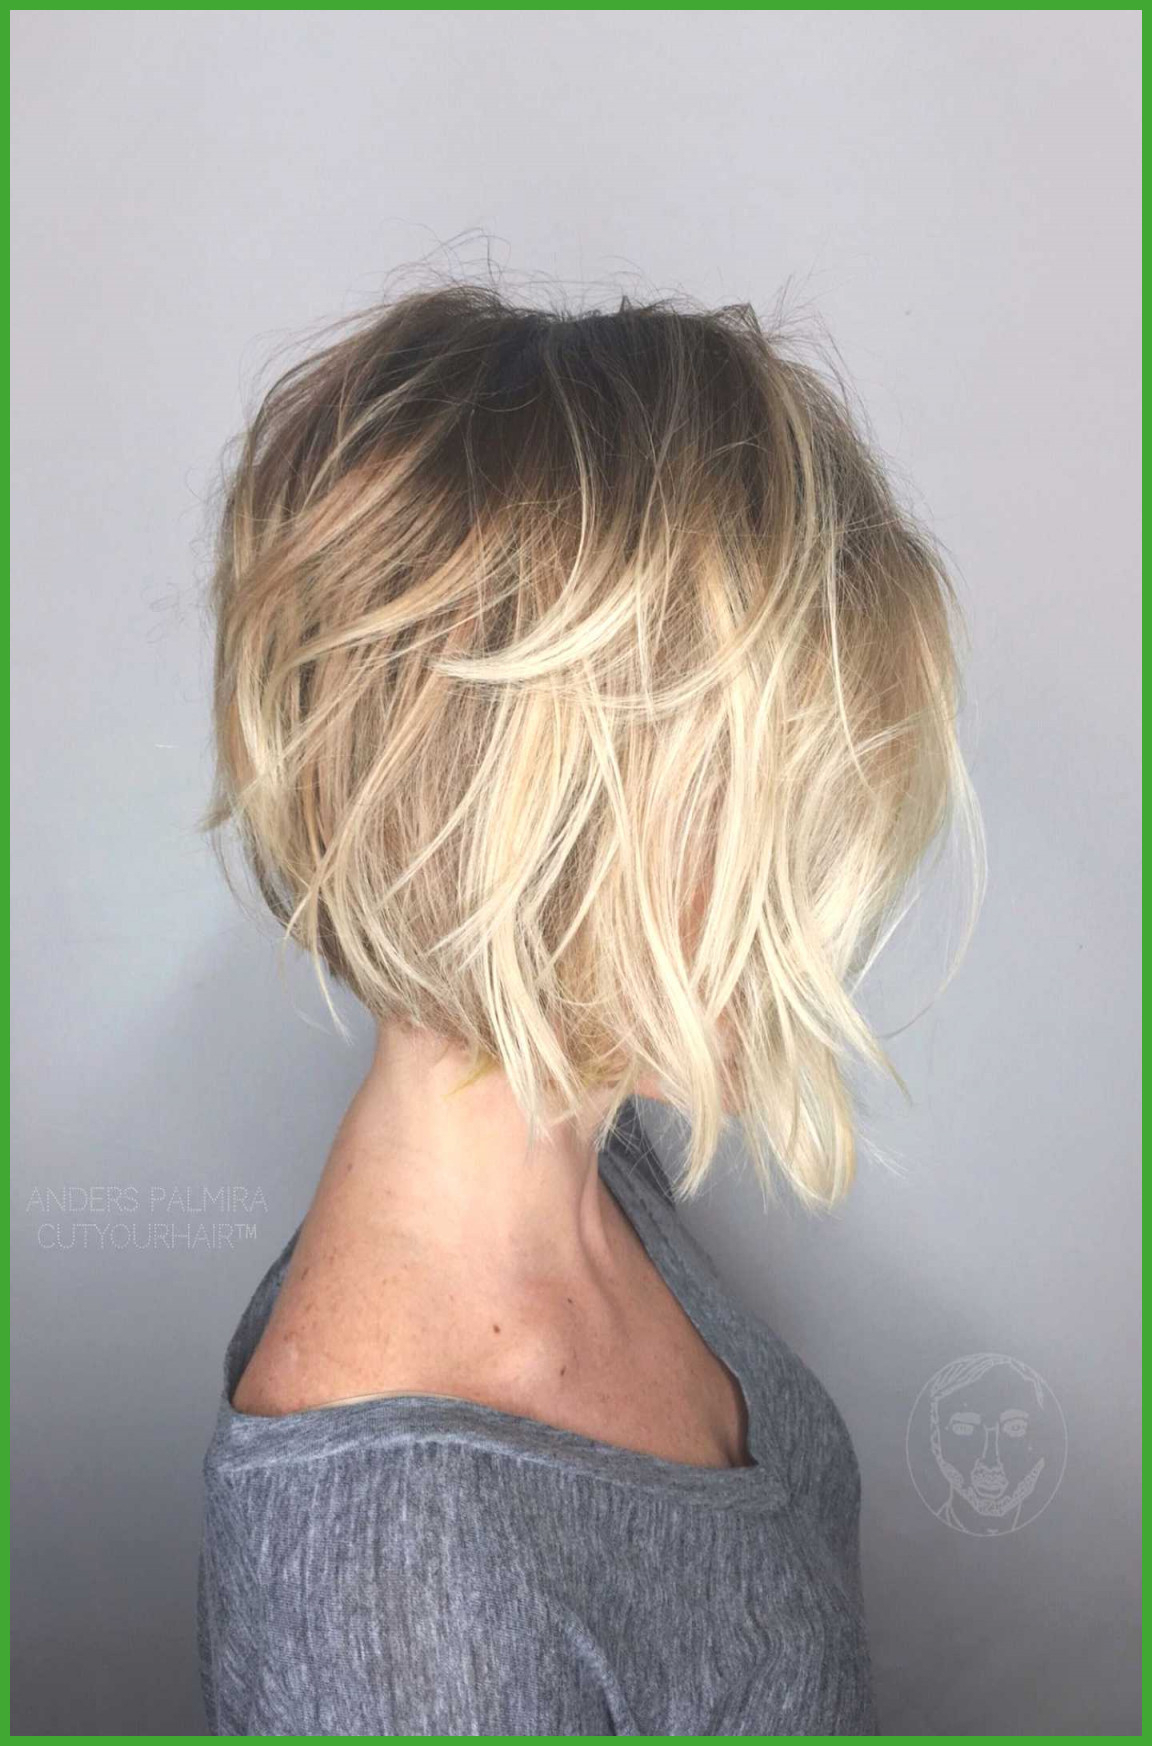 Fresh Short Shaggy Bob Hairstyles – Uternity With Cute Shaggy Short Haircuts (View 22 of 25)